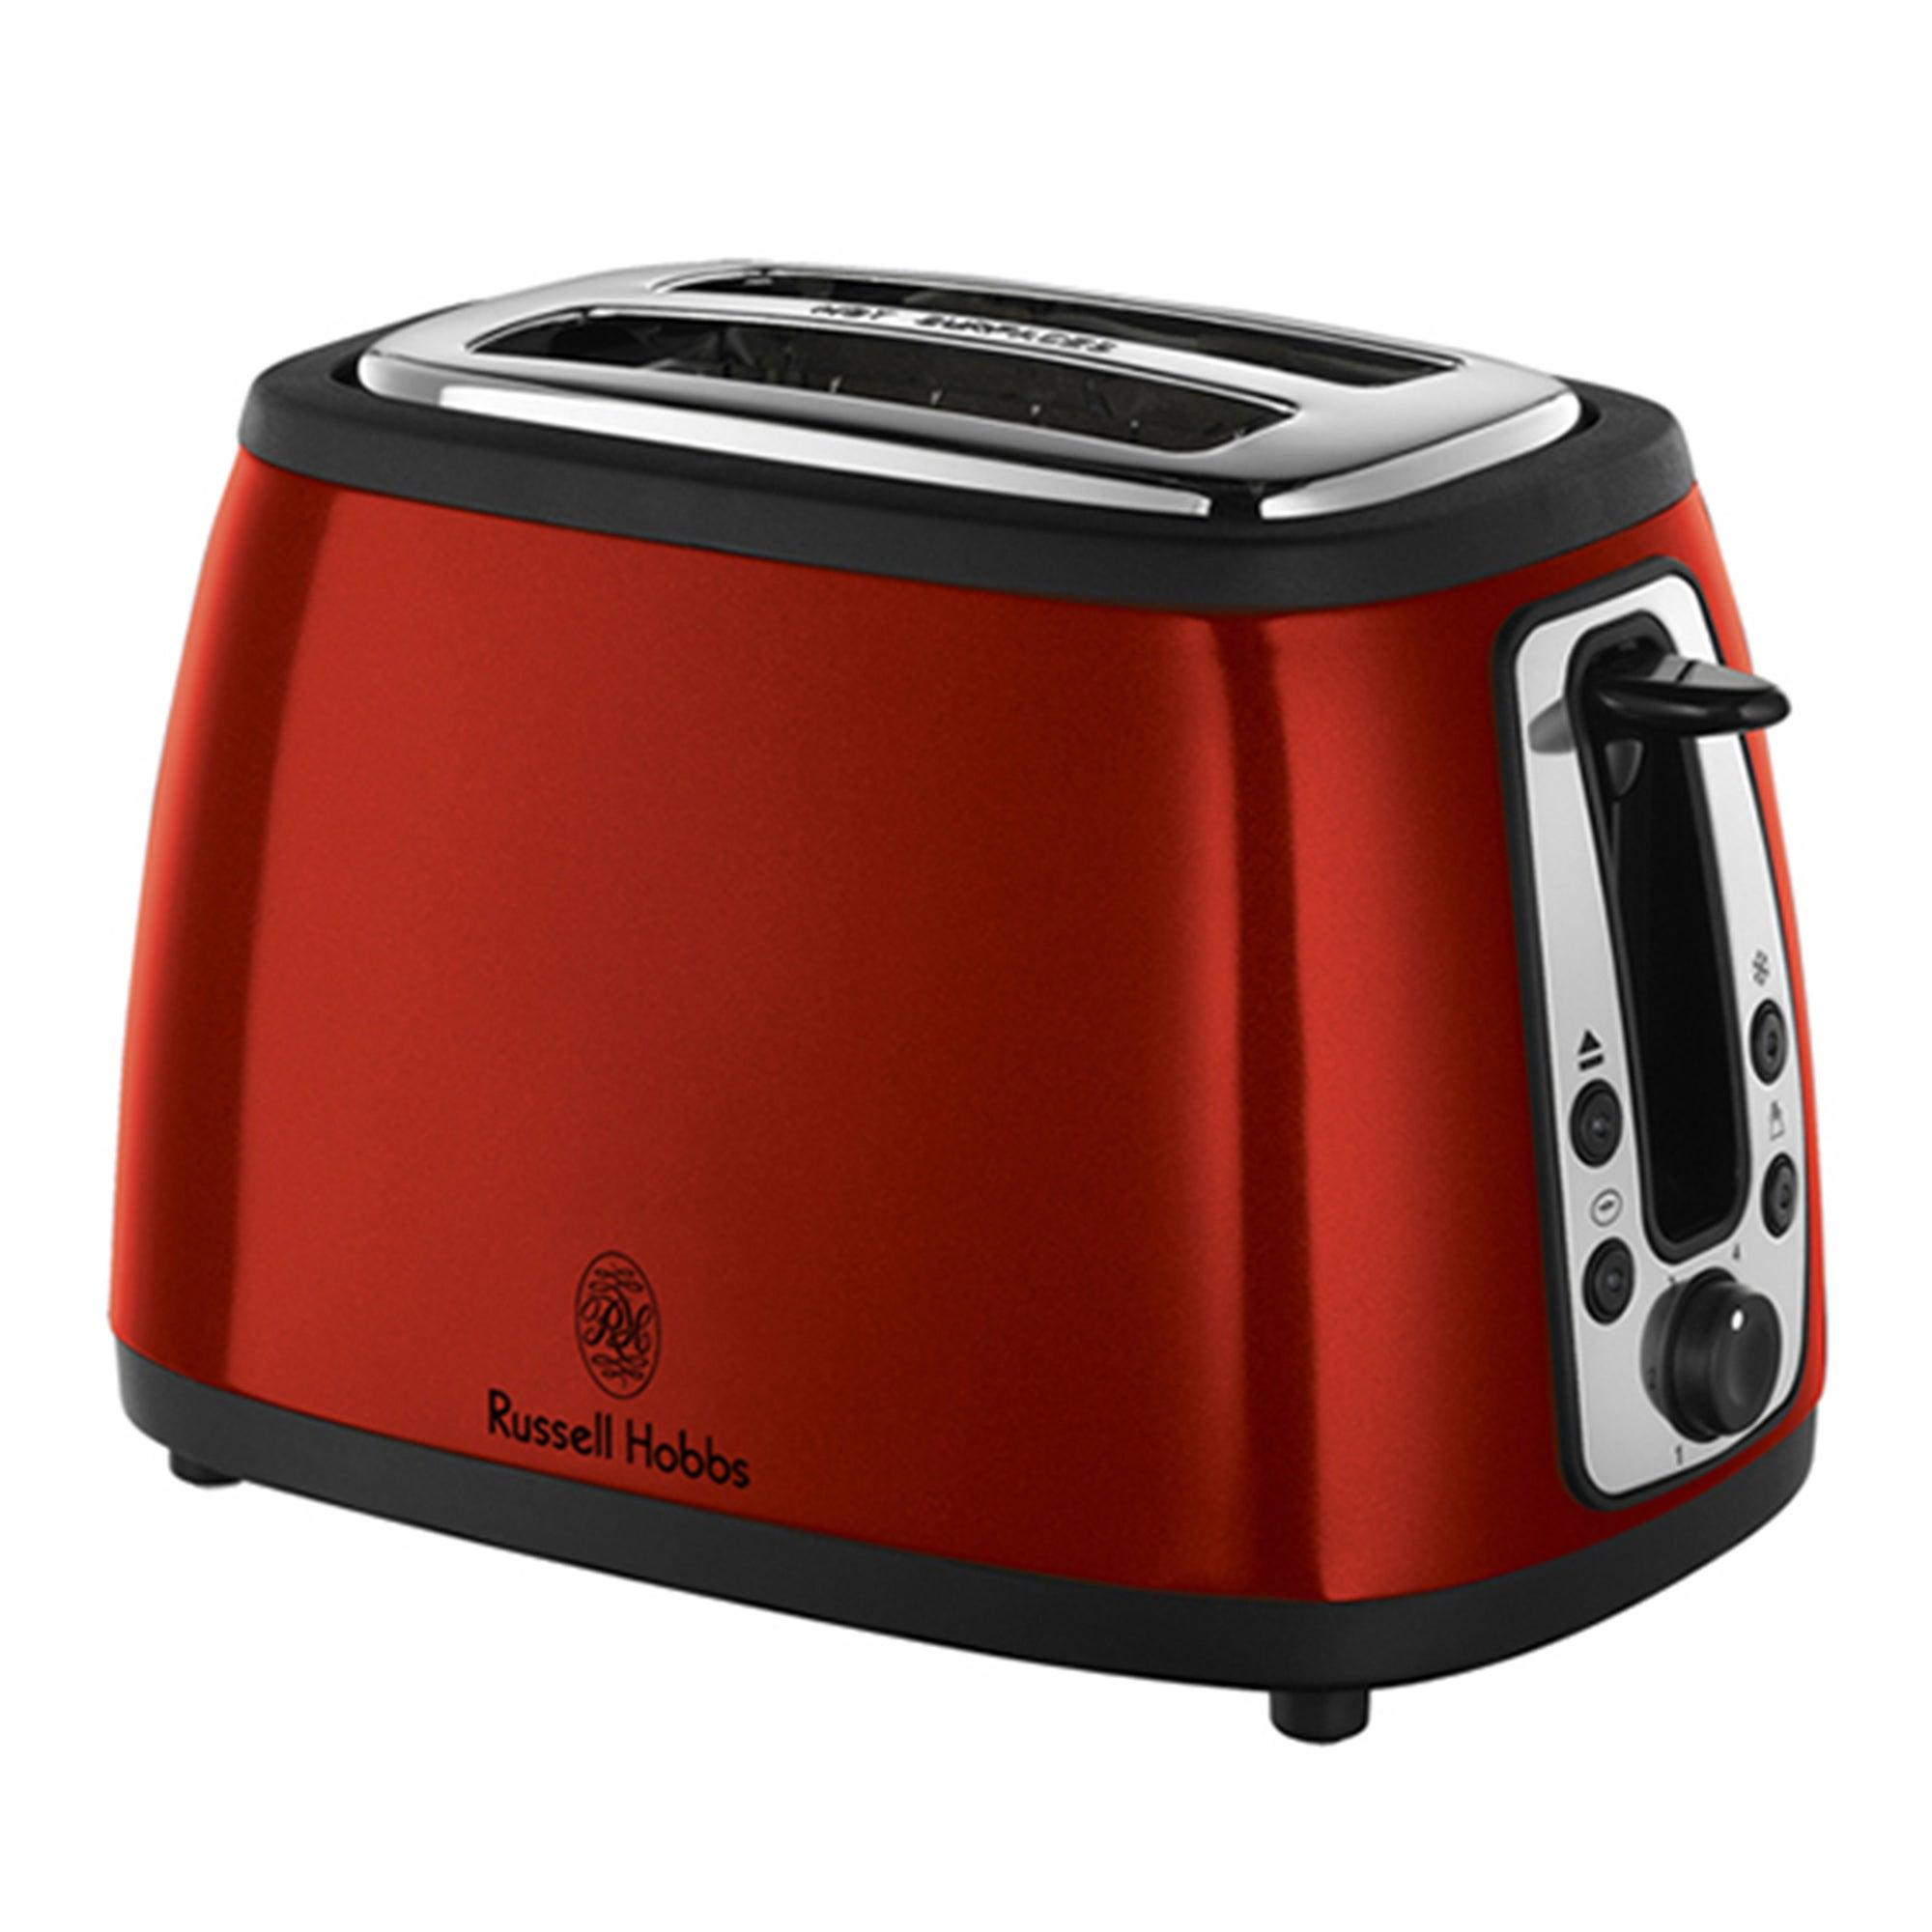 Russell Hobbs Heritage 18260 Metallic Red 2 Slice Toaster